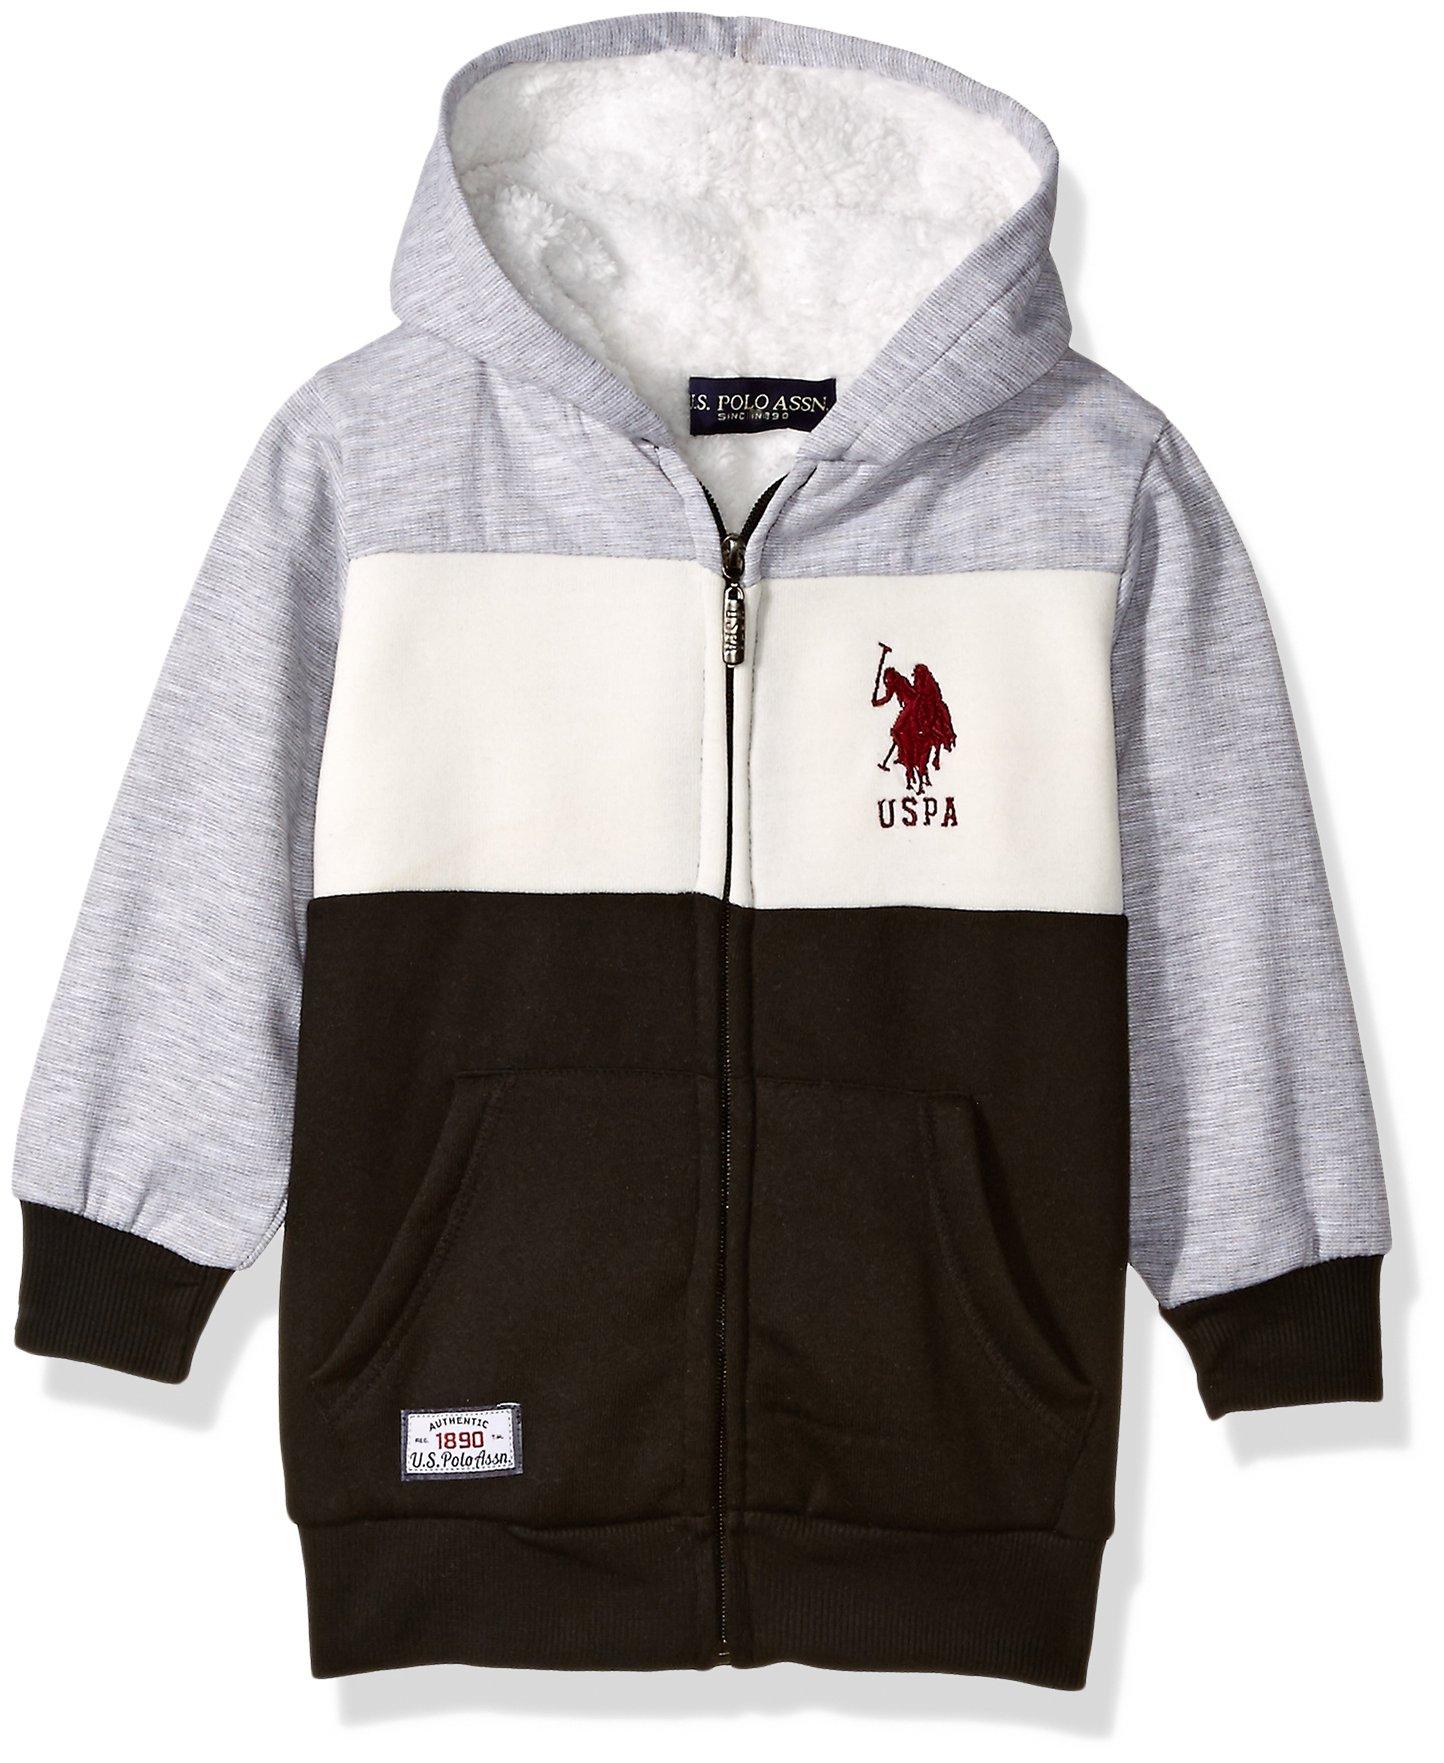 U.S. Polo Assn. Big Boys' Hooded Zip or Snap Fleece Jacket, Space Dye Colorblock Medium Grey, 14/16